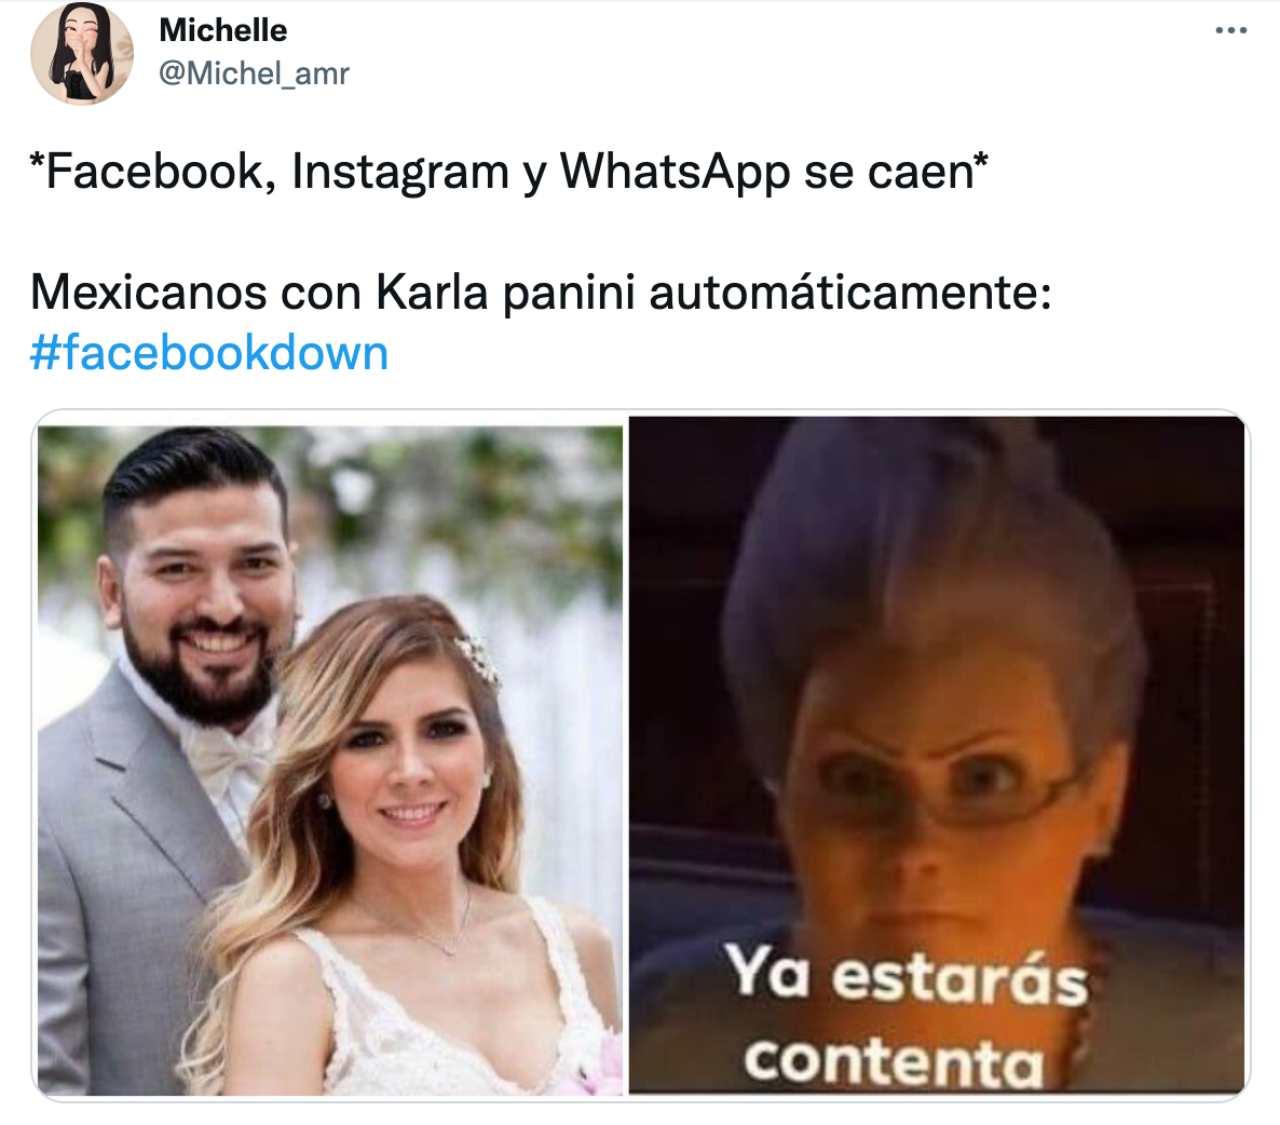 Culpan Karla Panini caida Facebook Instagram WhatsApp